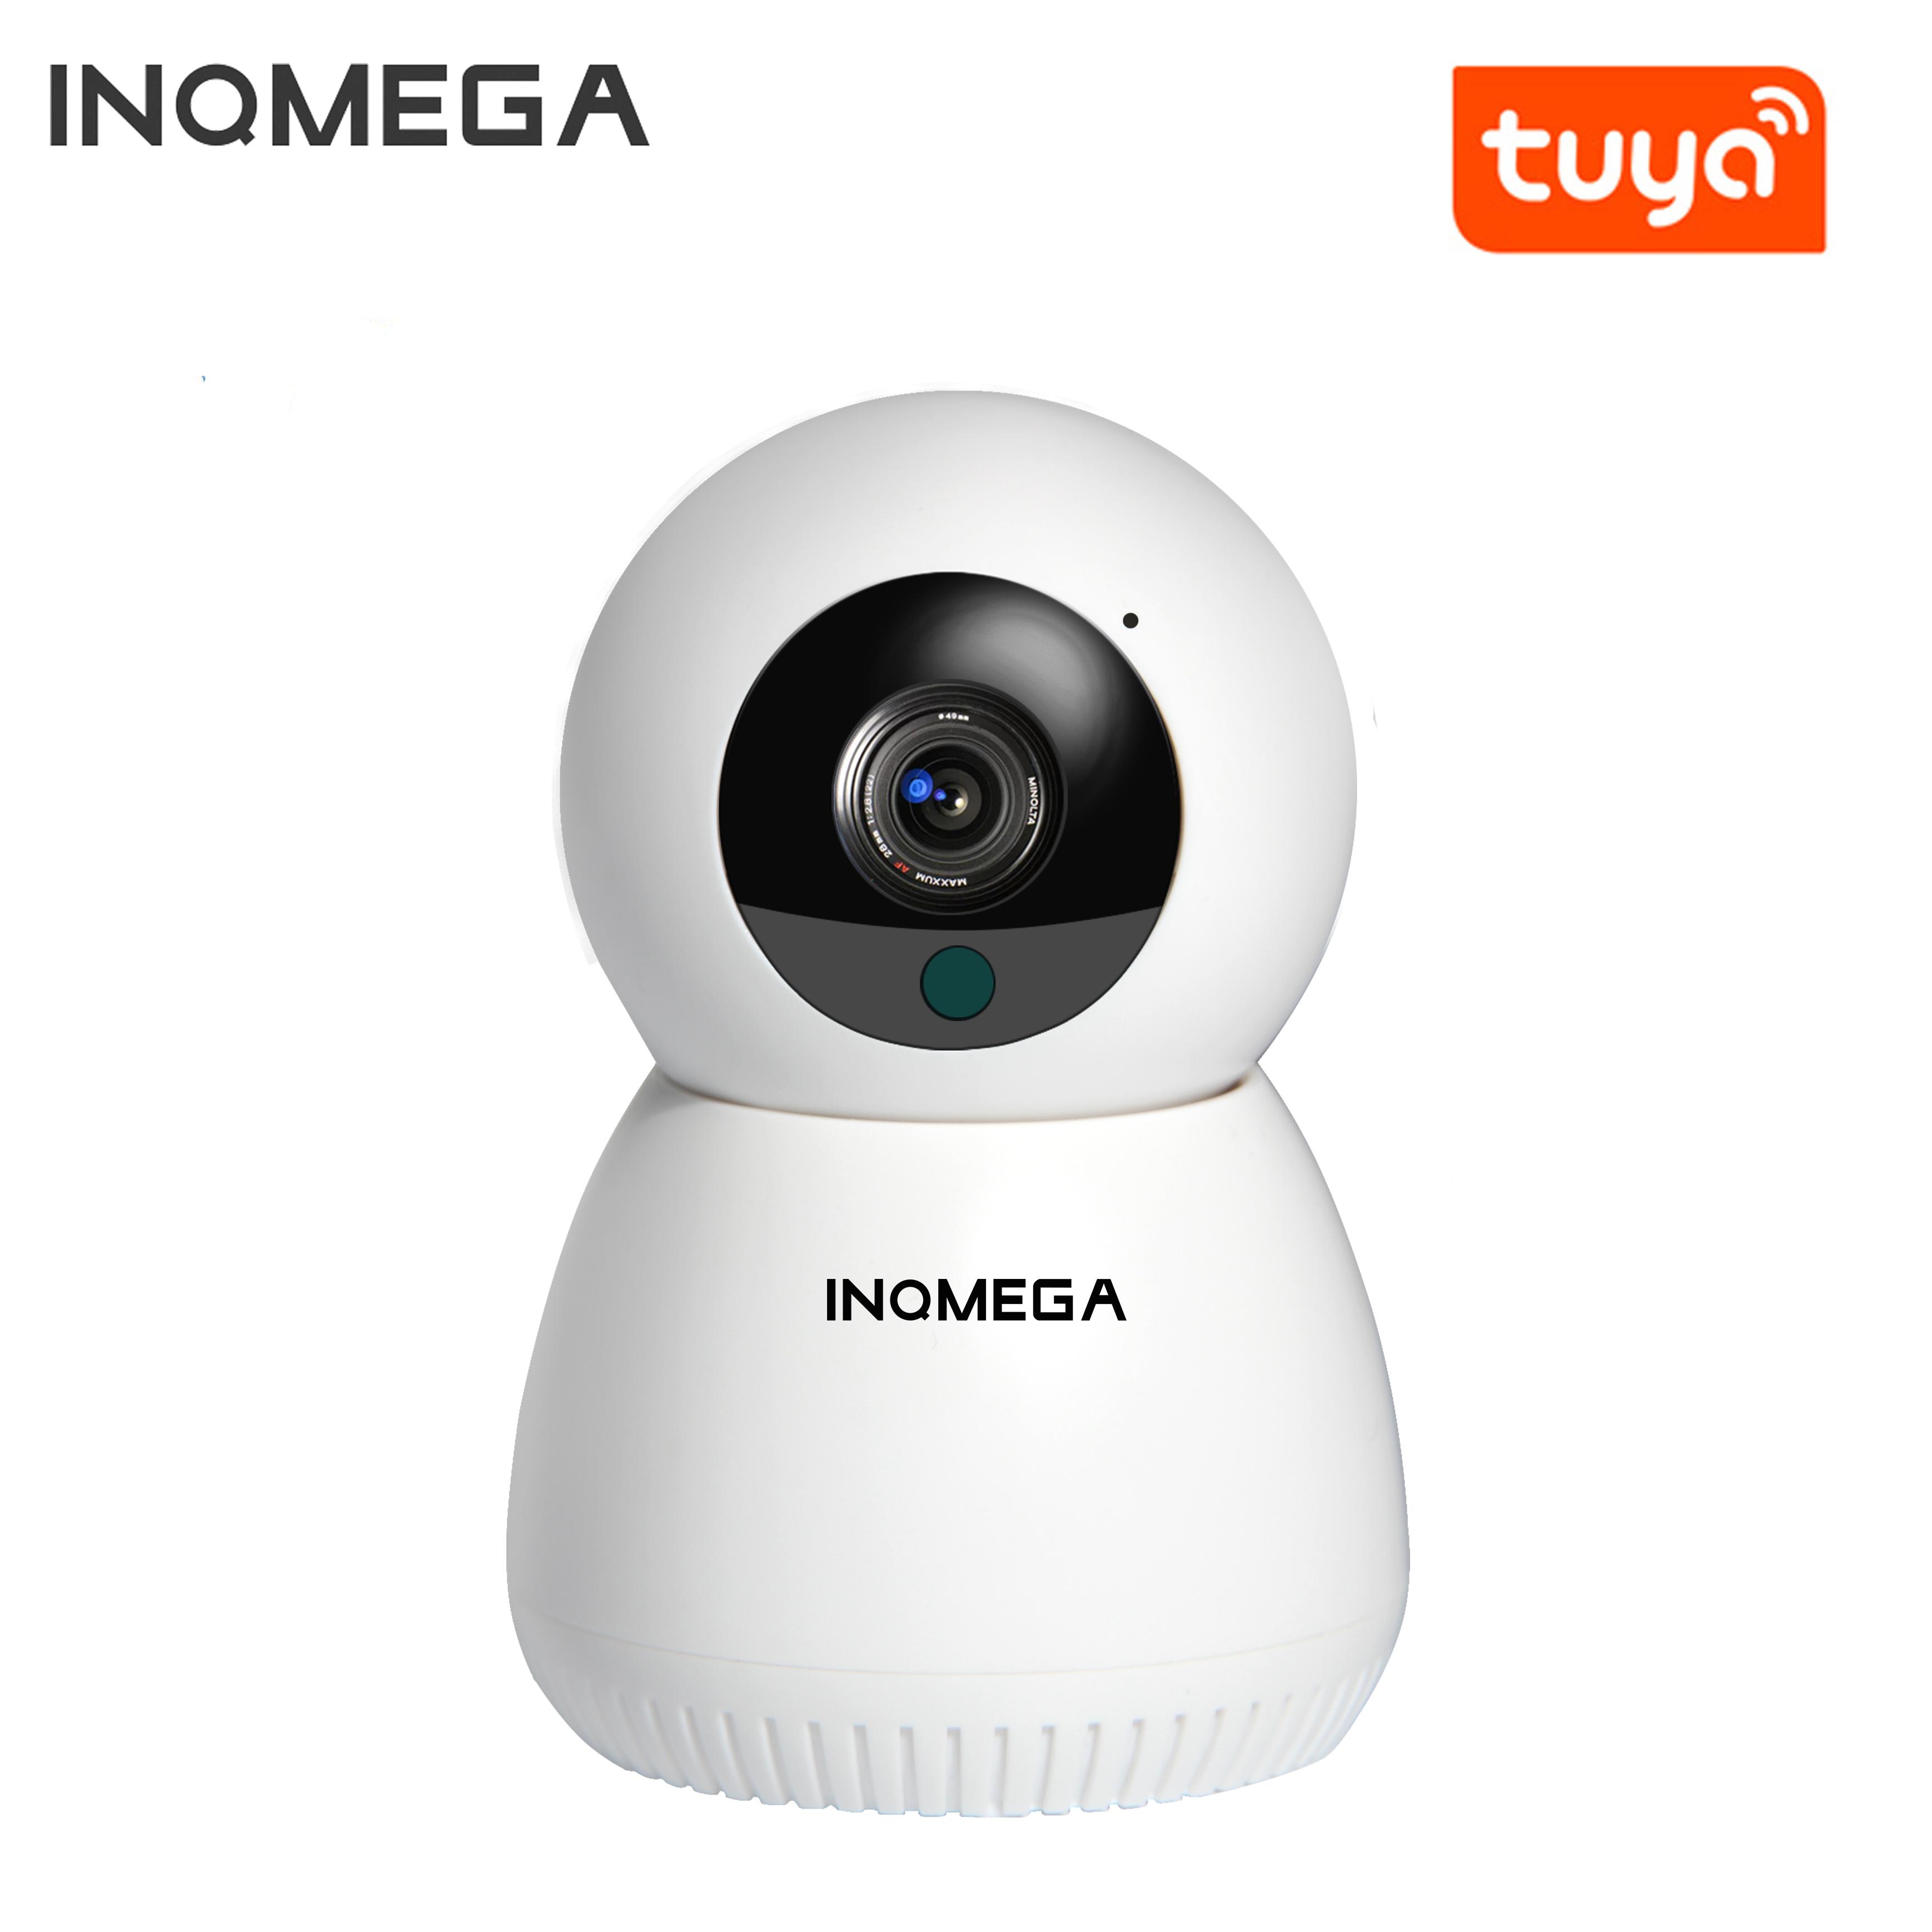 INQMEGA 1080P 720P IP Camera WiFi Wireless Mini Smart Home Security CCTV Camera Two-way Audio Night Vision Baby Monitor APP TUYA